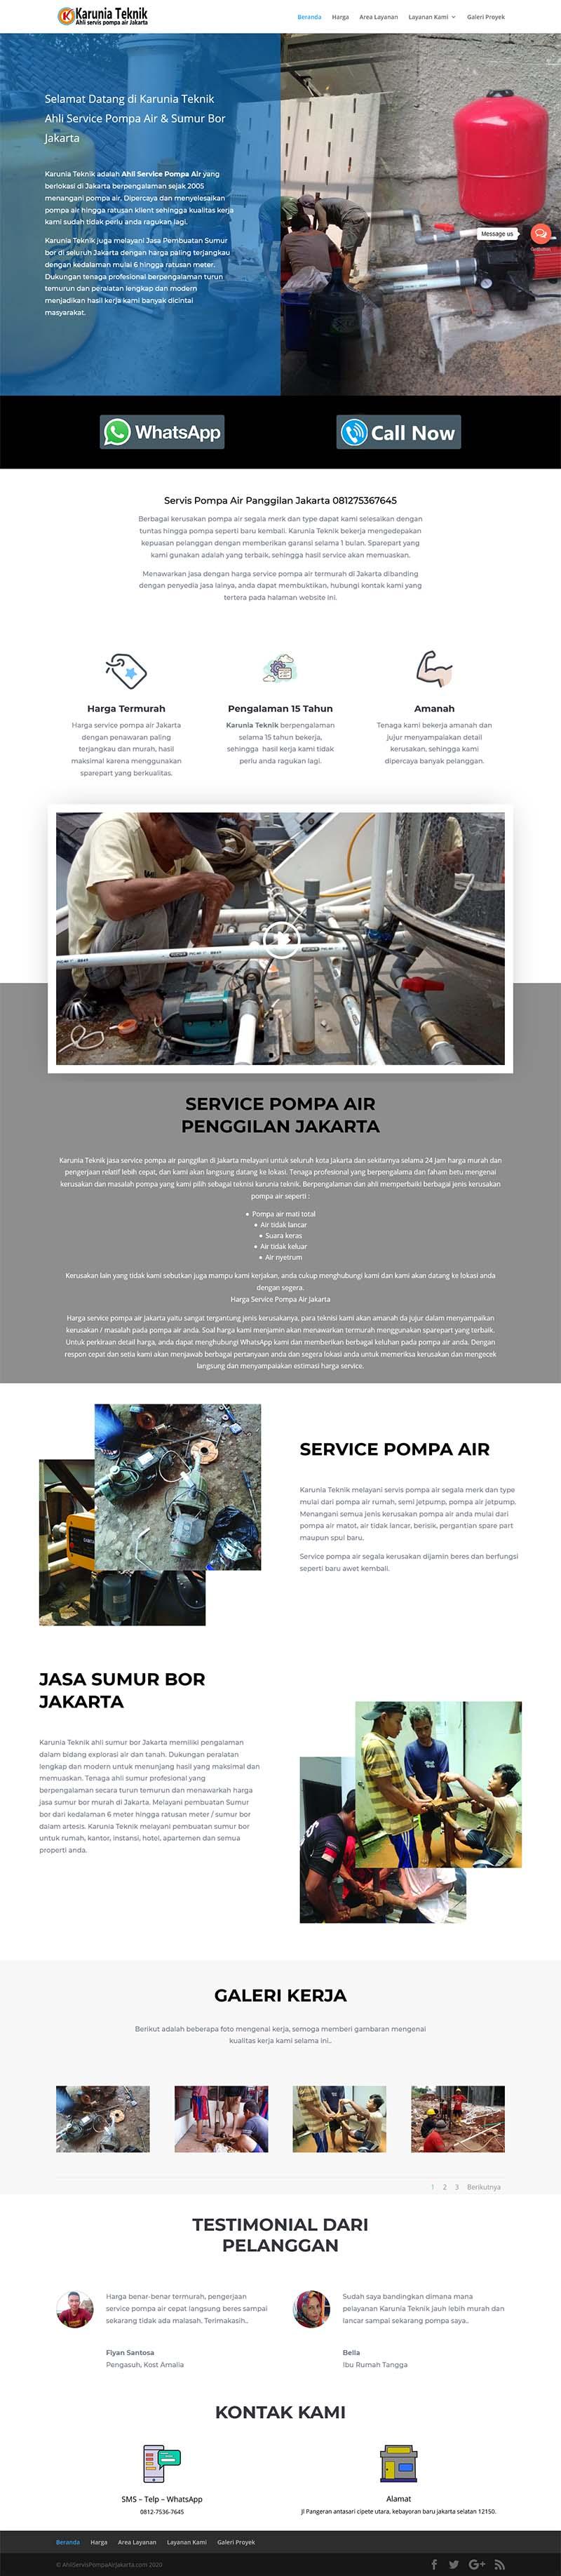 contoh website usaha 2